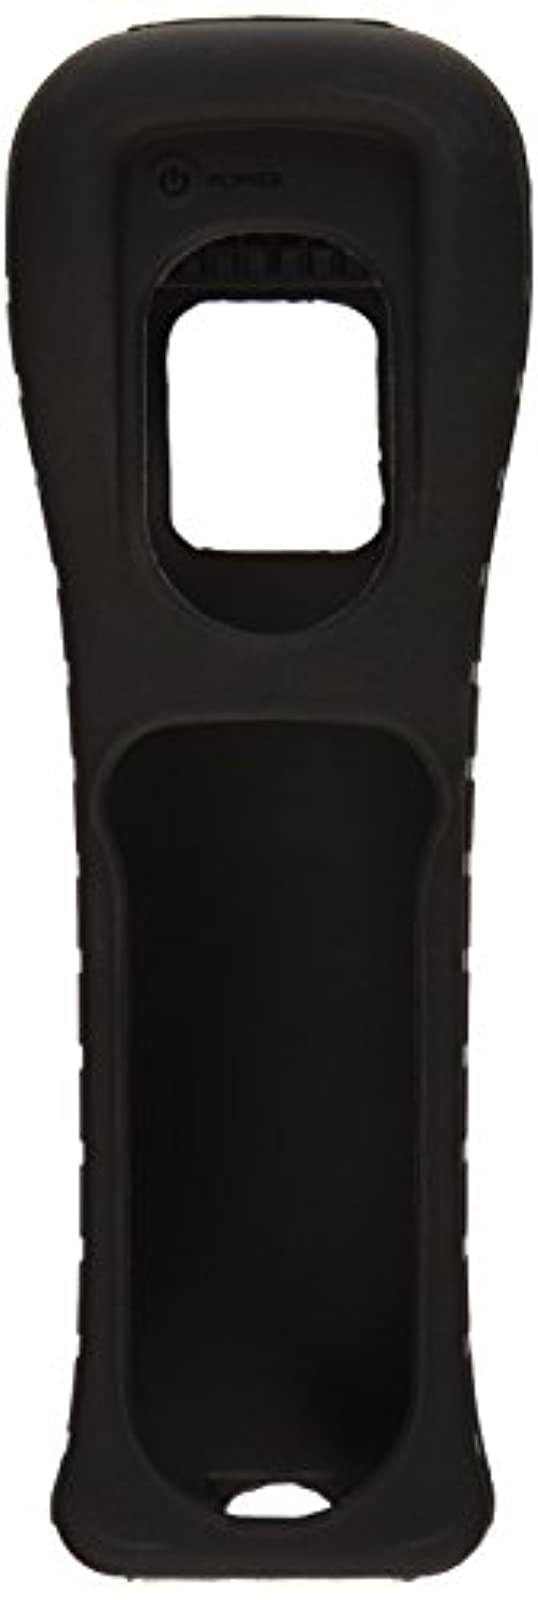 Nintendo OEM Wii Remote Black Jacket Skin Silicone Wiimote Cover